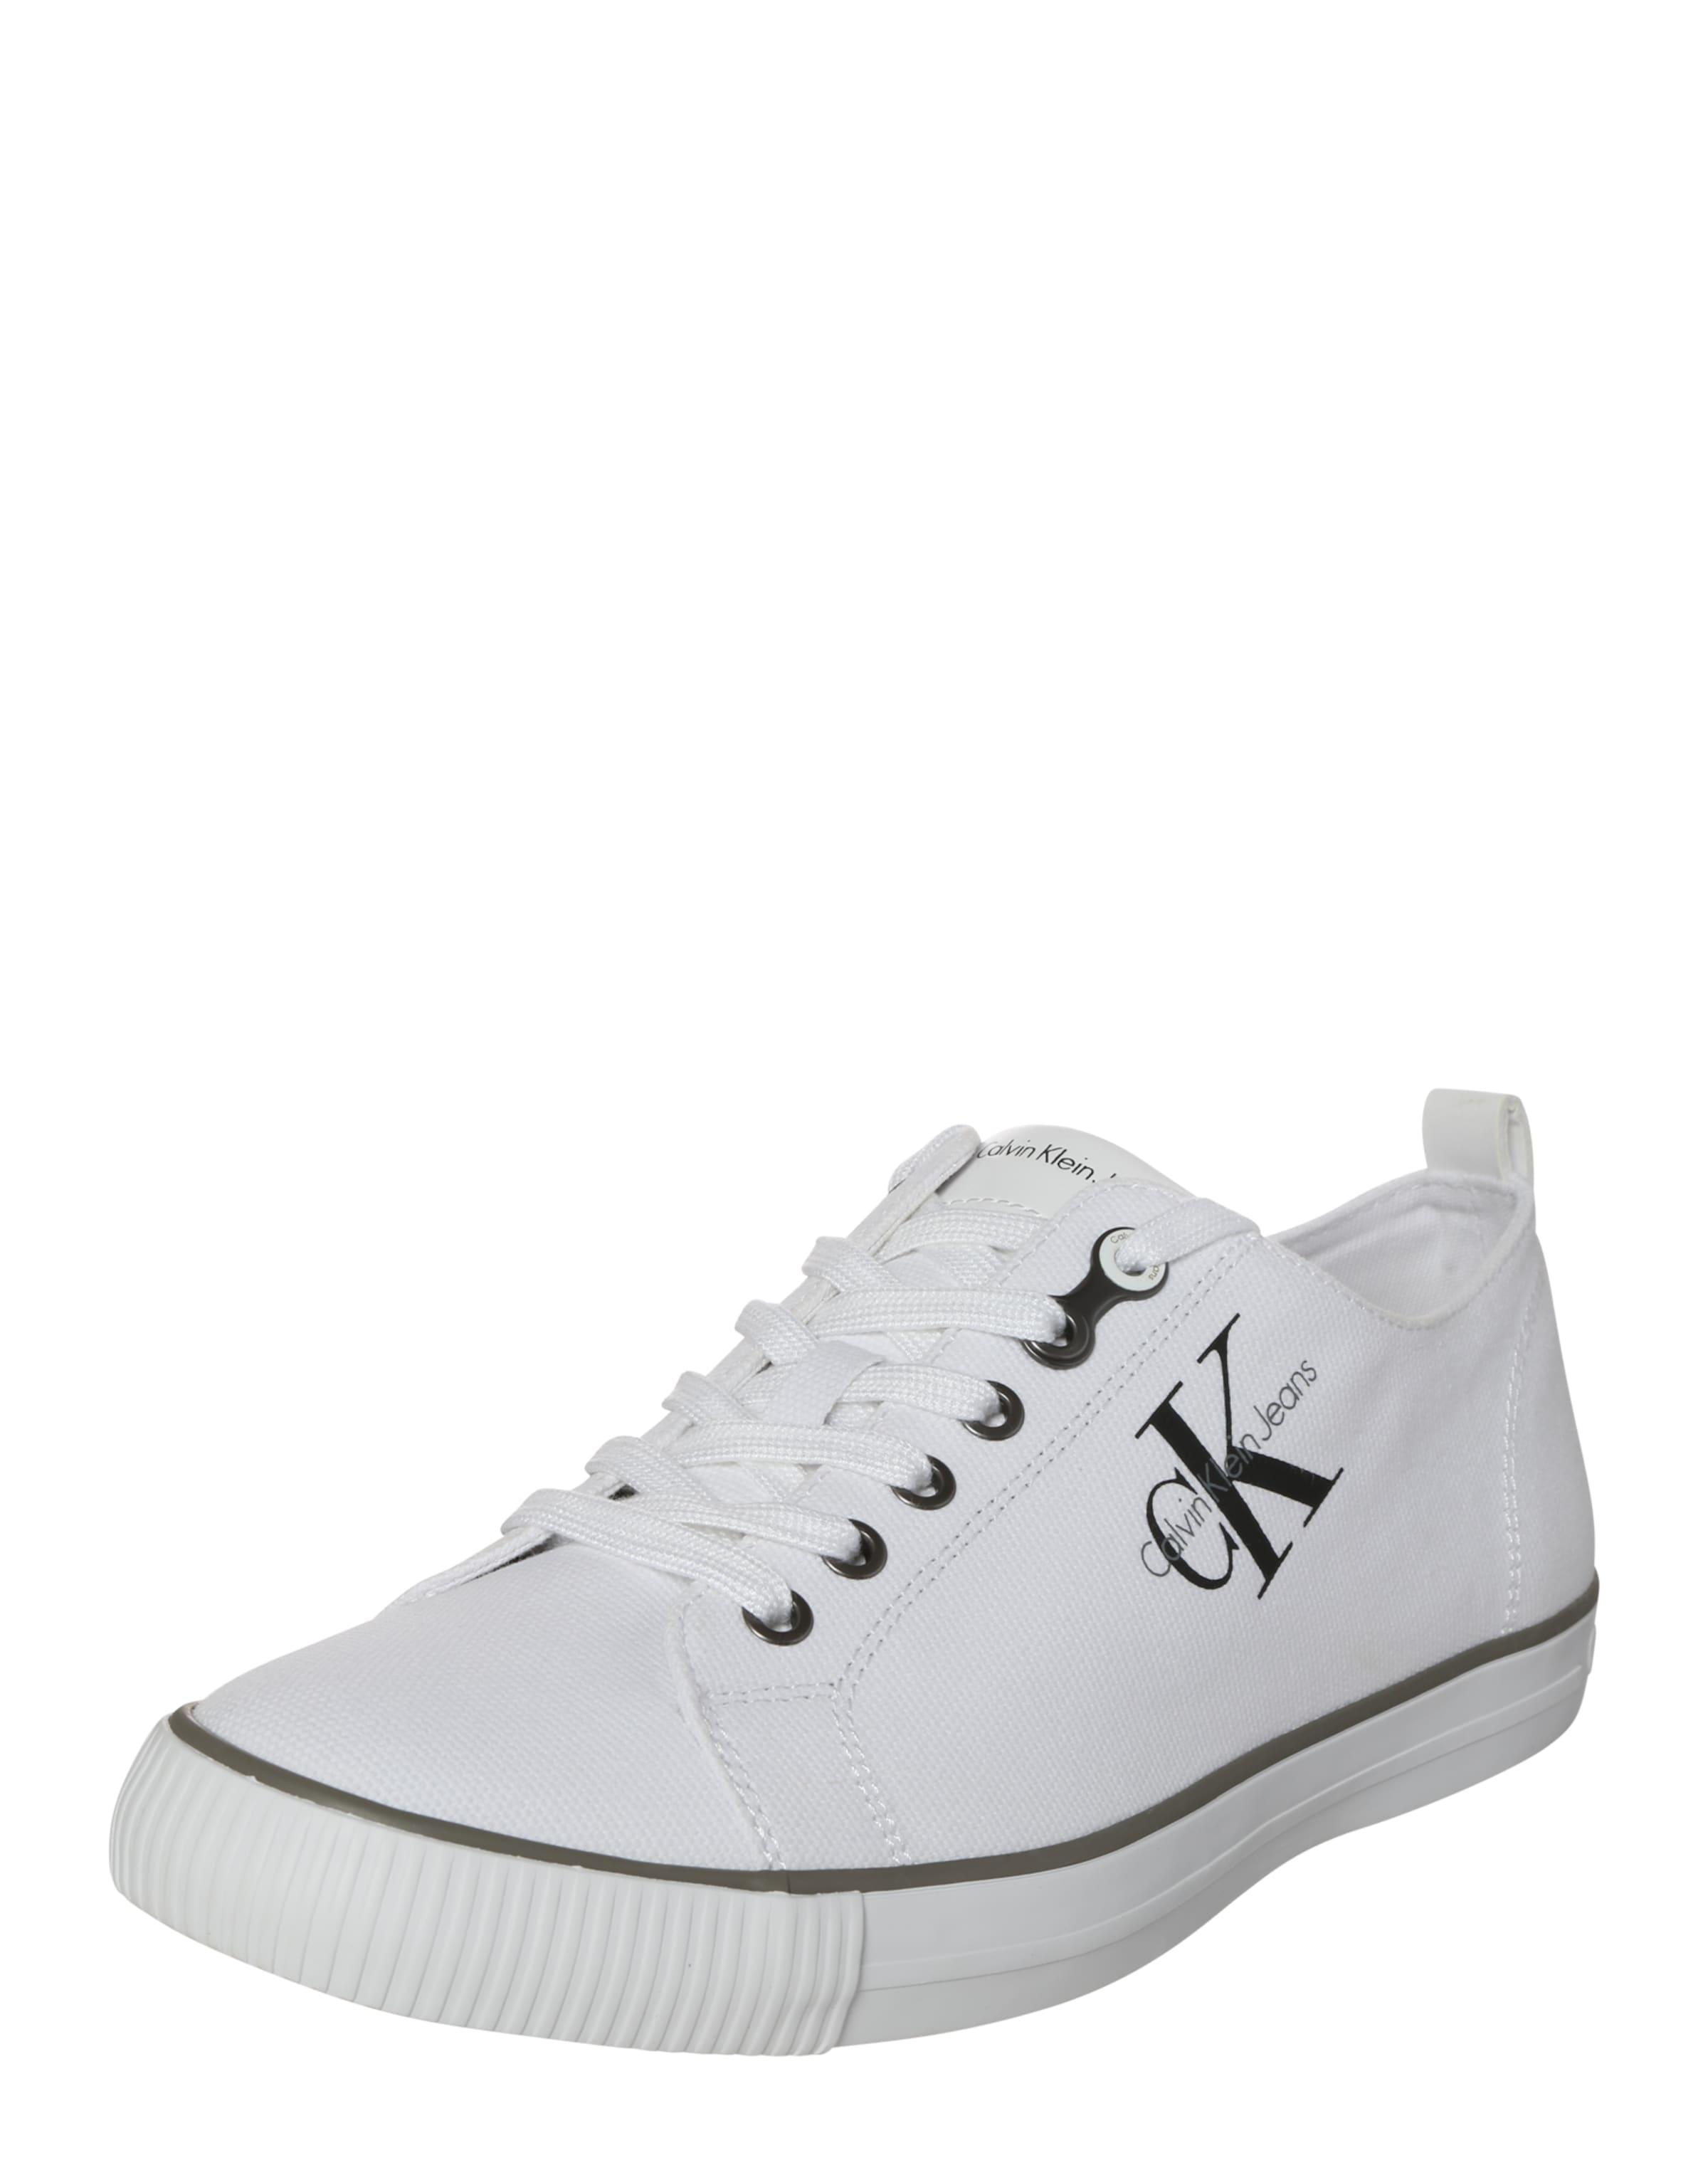 Calvin Klein Jeans Sneaker Sneaker Jeans Arnold Hohe Qualität eea66f